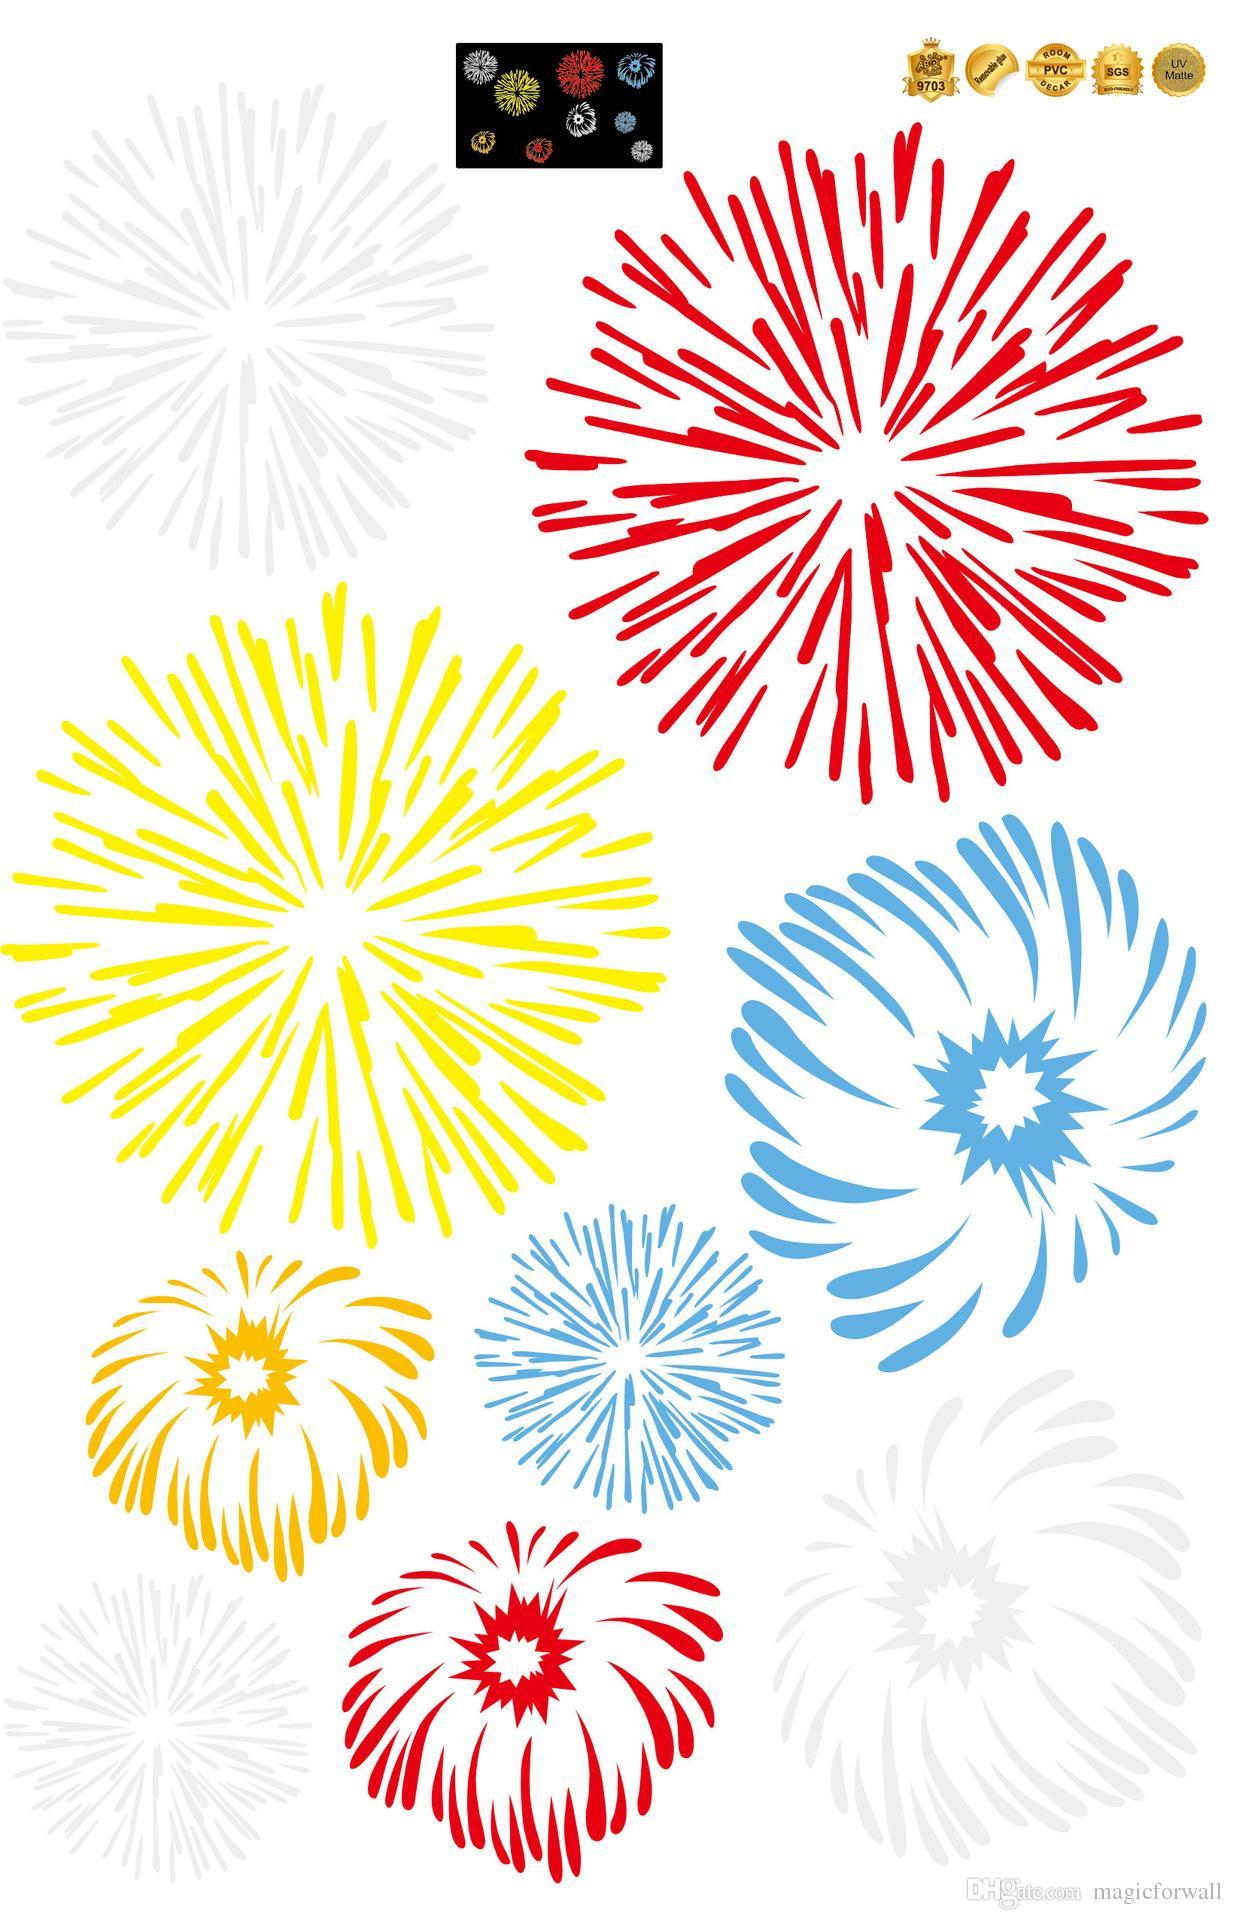 Festival clipart sparkler Latest Peace Wall Sticker For